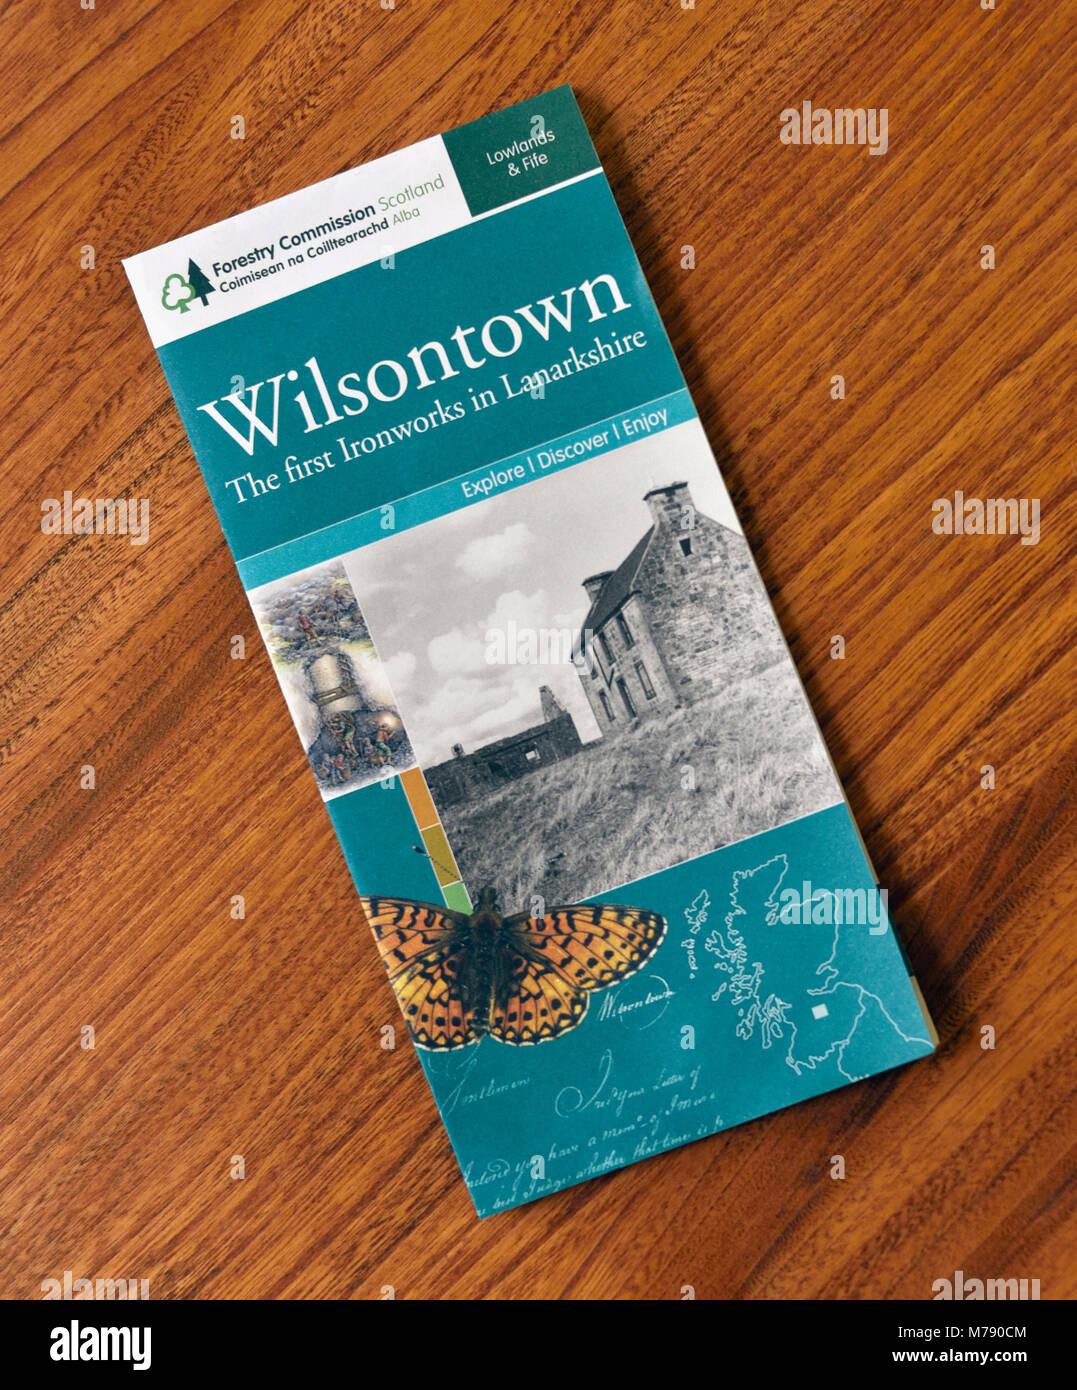 Forestry Commission Scotland brochure. Wilsontown, Forth, Lanarkshire, Scotland, United Kingdom, Europe. - Stock Image